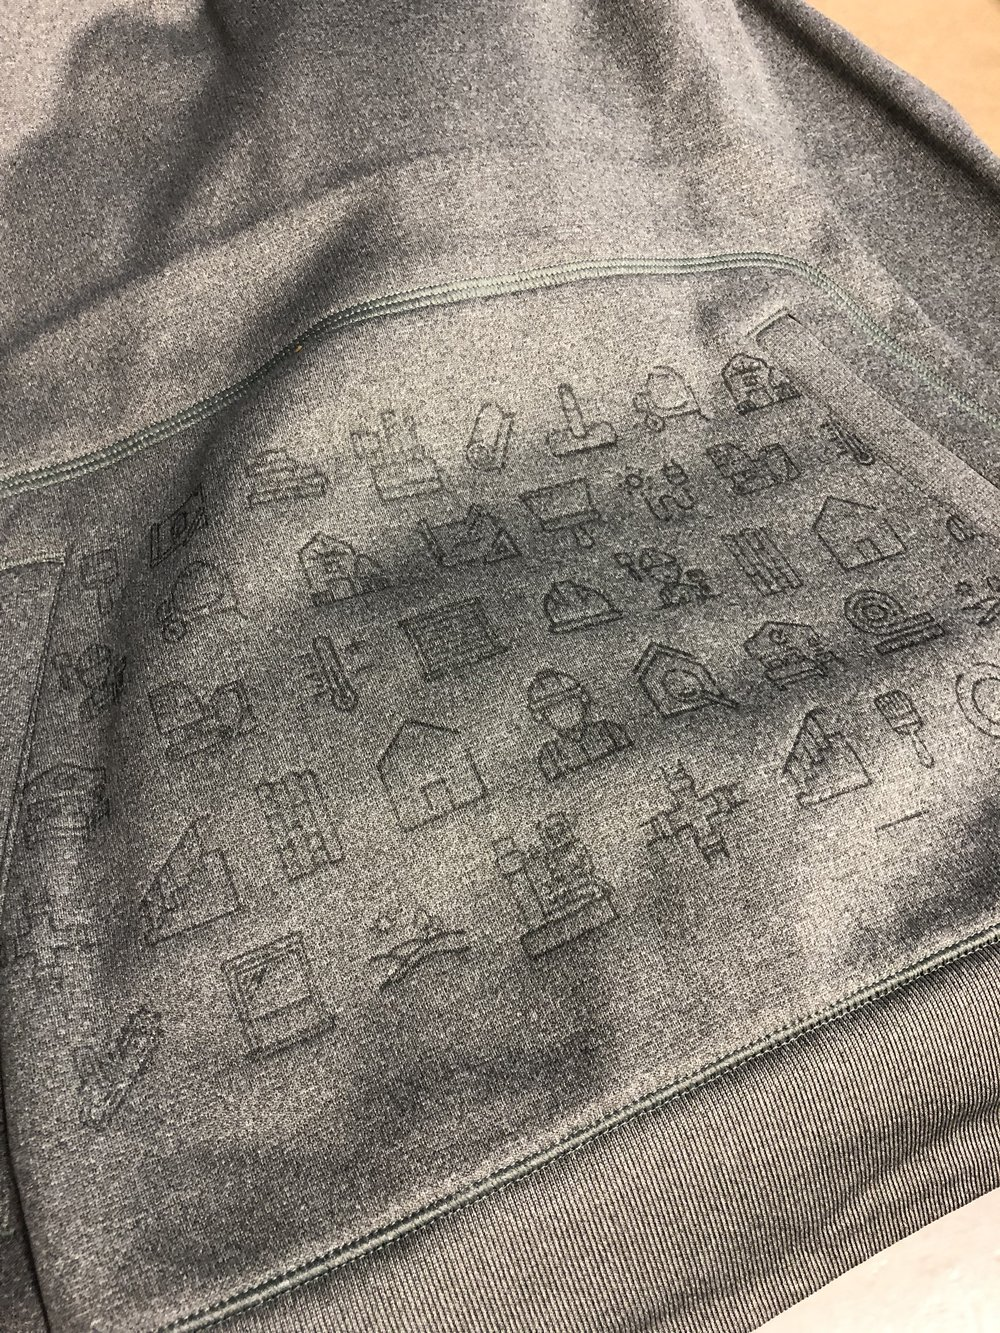 logounltd_laser_etching_embroidery_screen_printing_apparel_uniform_custom_tshirts_kirkland_bellevue_seattle_redmond_woodinville_branded_merchandise_promotional_products_logo_unltd_ tshirts_design_custom (15).jpg